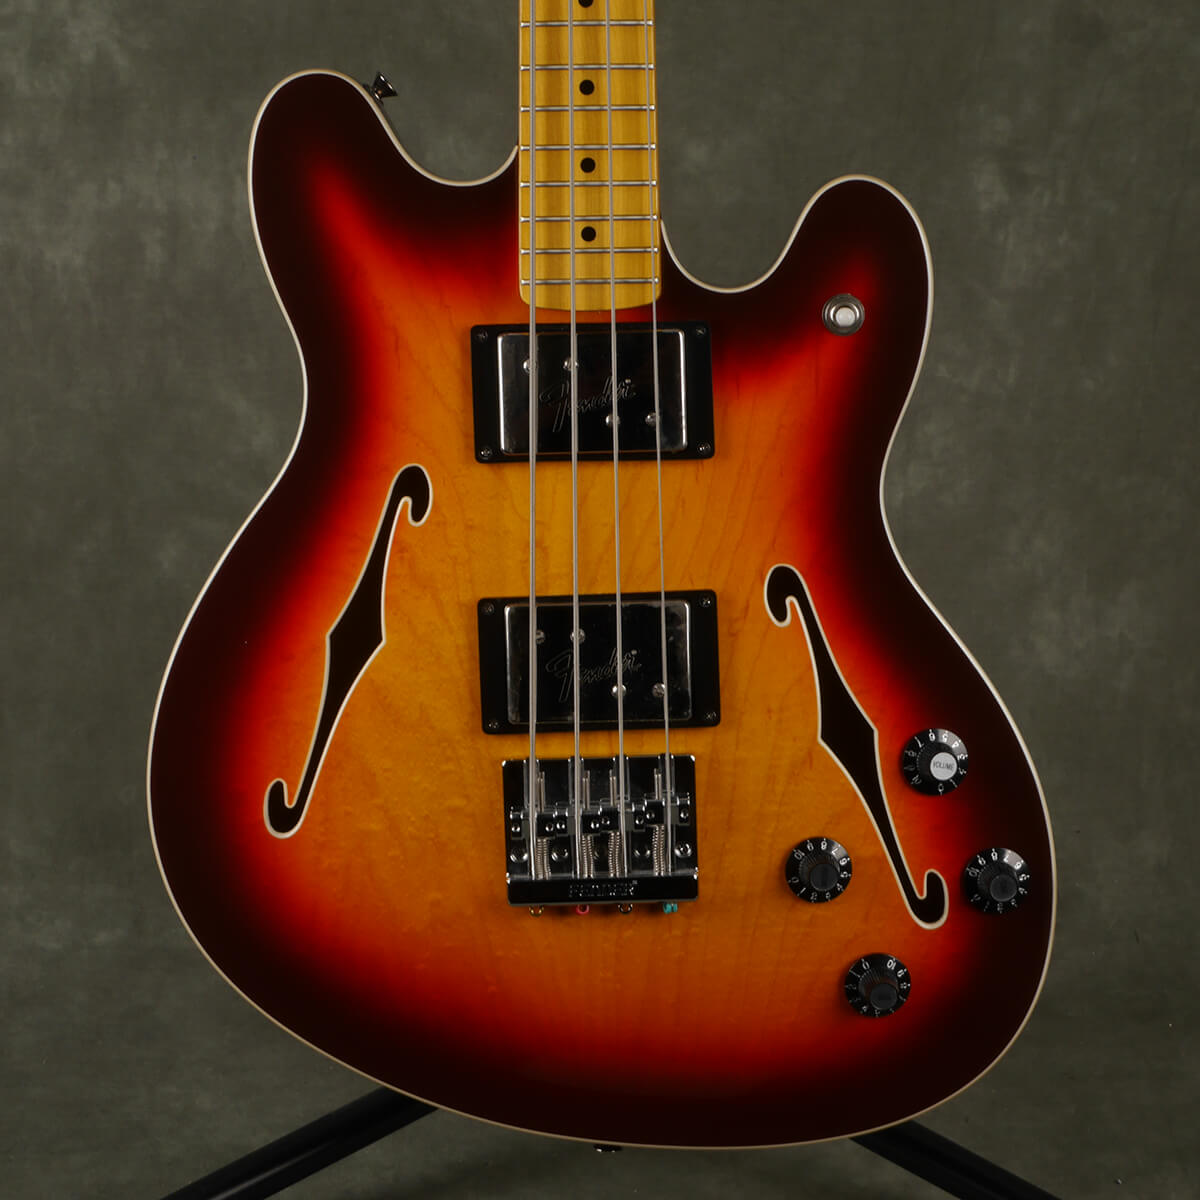 Fender Starcaster Bass Guitar - Sunburst - 2nd Hand